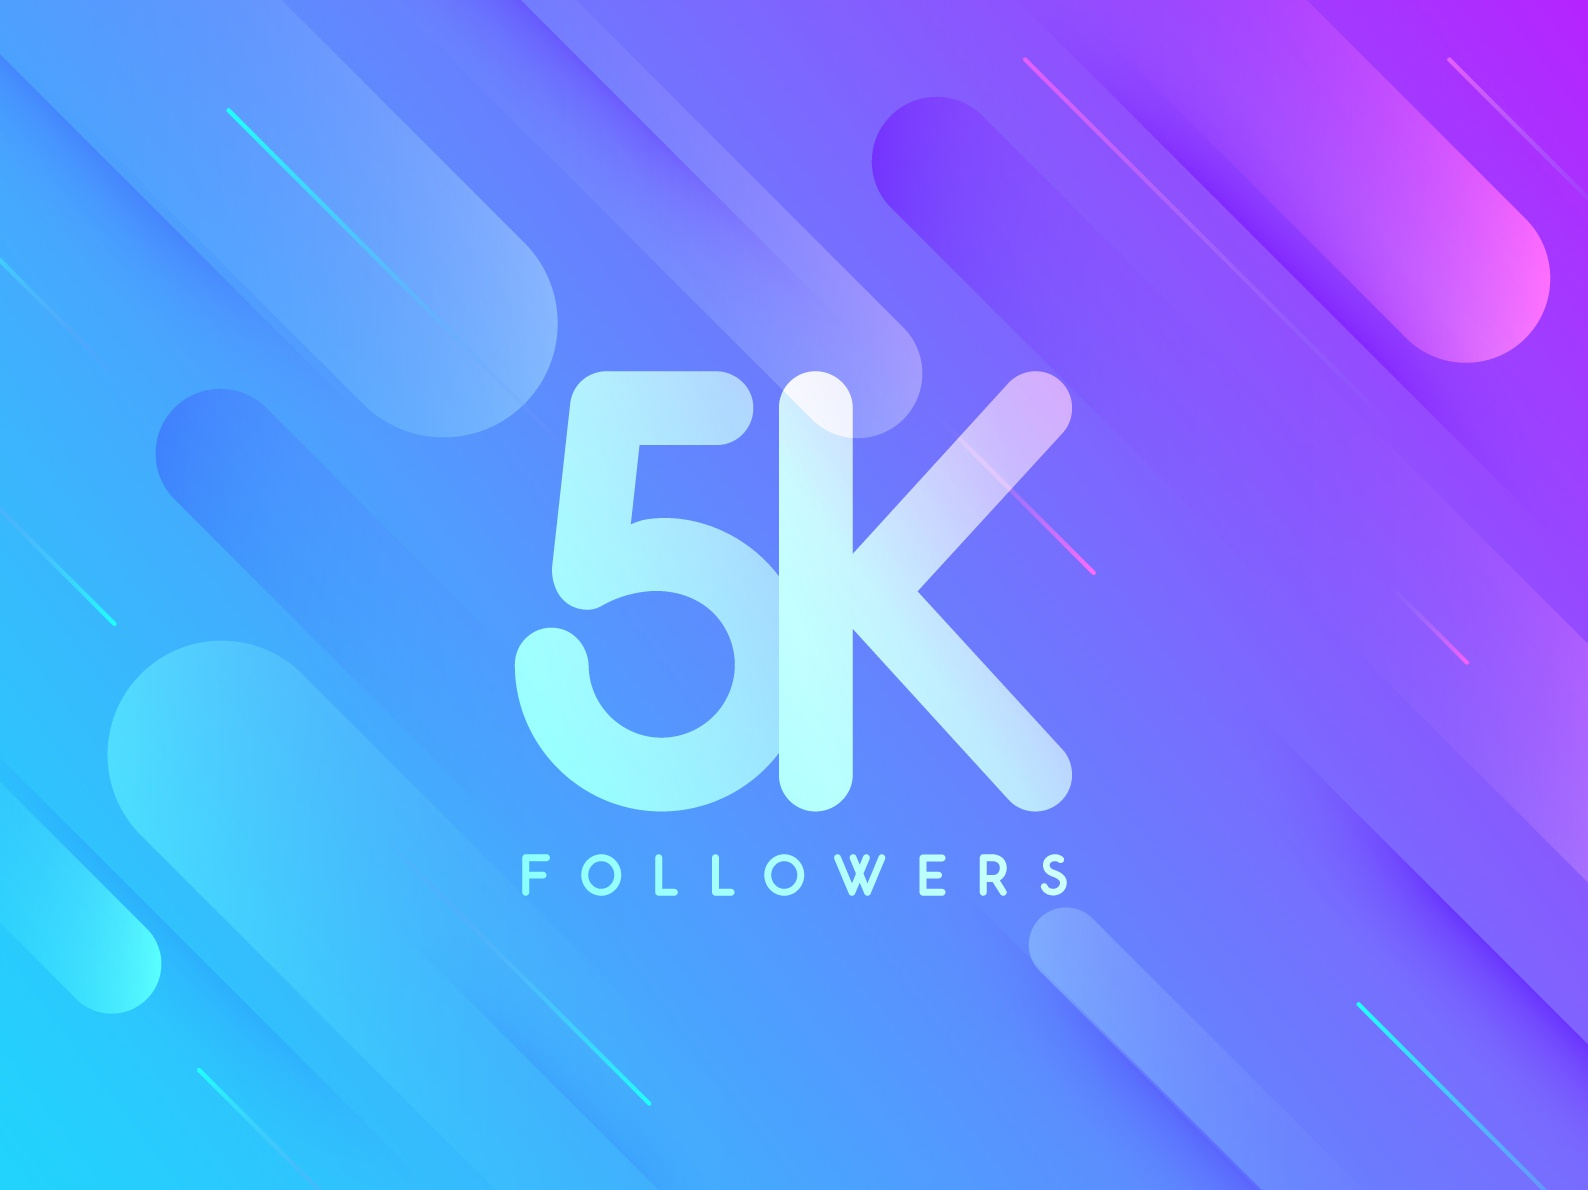 5k Fans thanks thankyou simple shapes minimalistic friends minimal typogaphy illustration color clean colorful follower 5k followers 5000 5k followers fans dribbble design